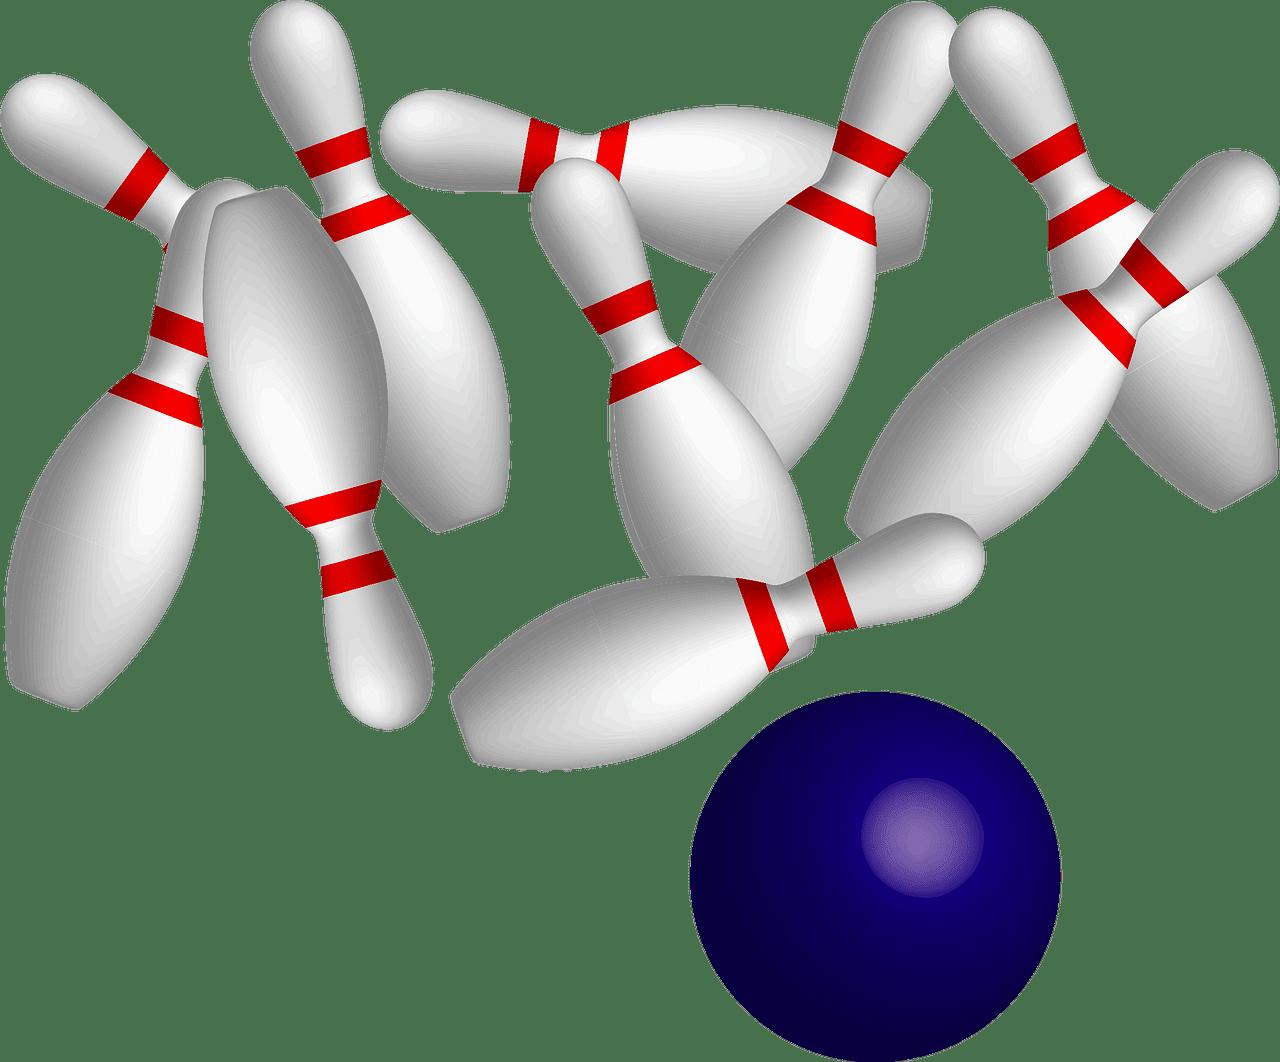 Bowling clipart transparent background